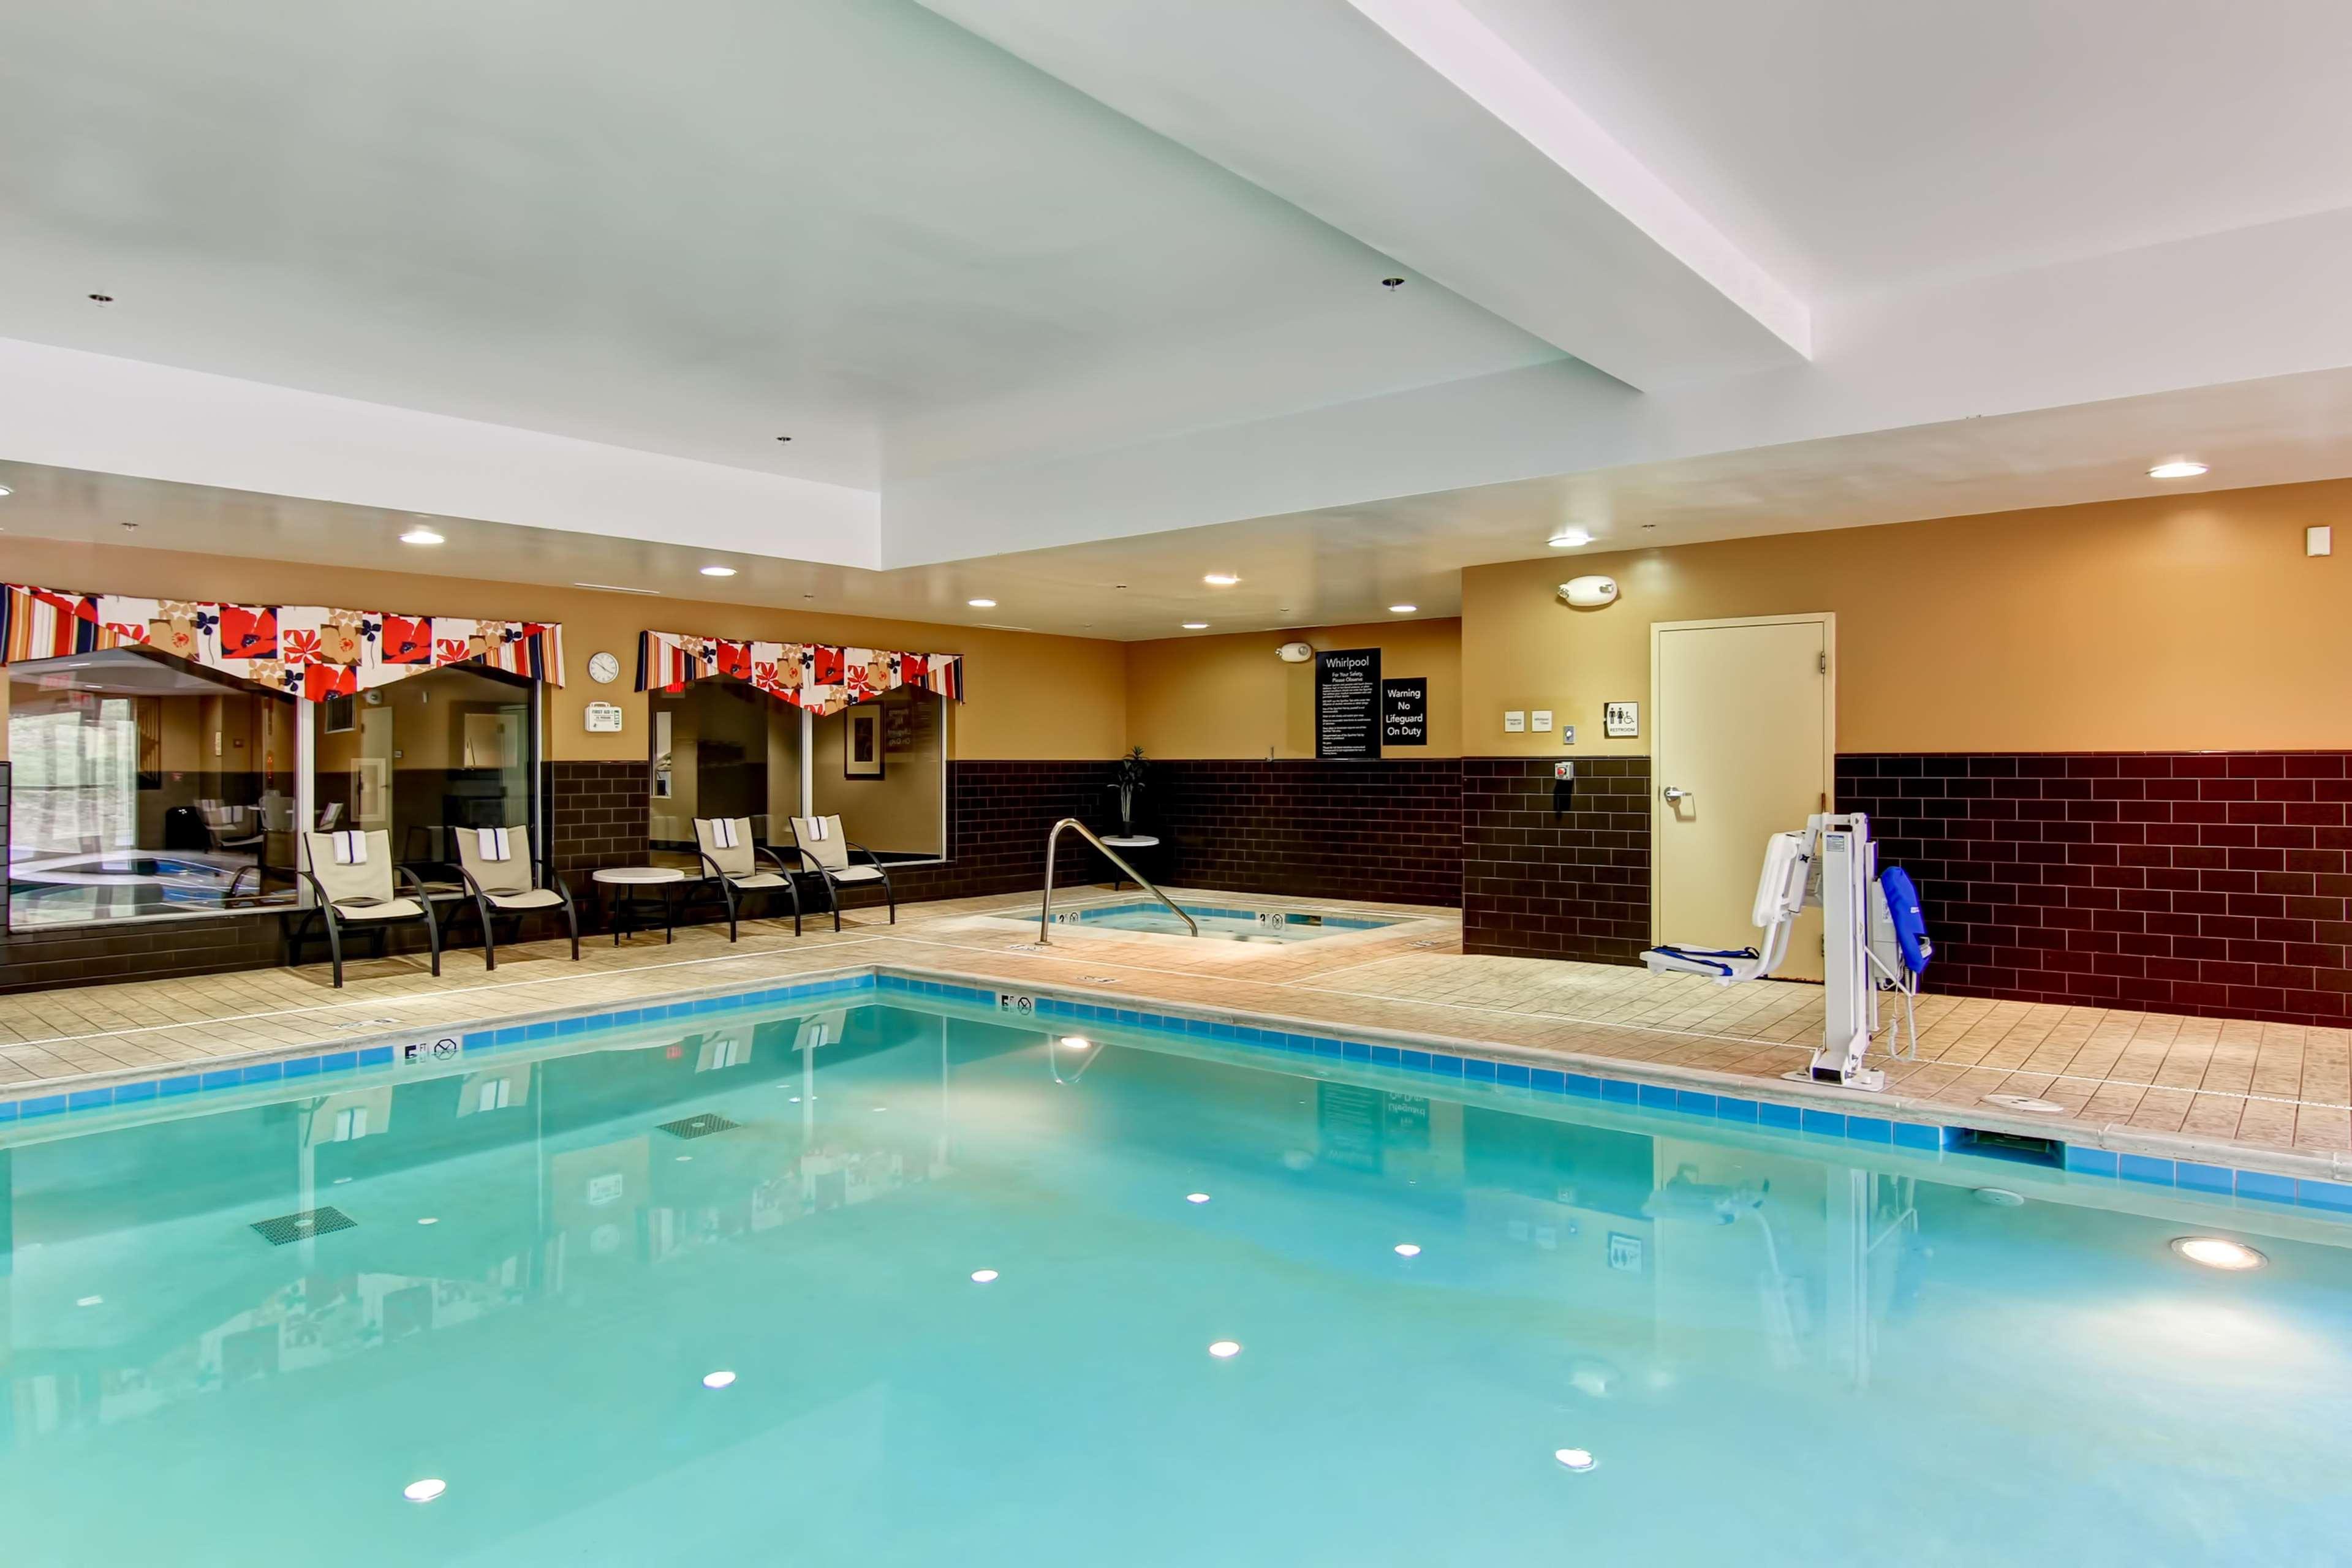 Homewood Suites by Hilton Cincinnati Airport South-Florence image 6